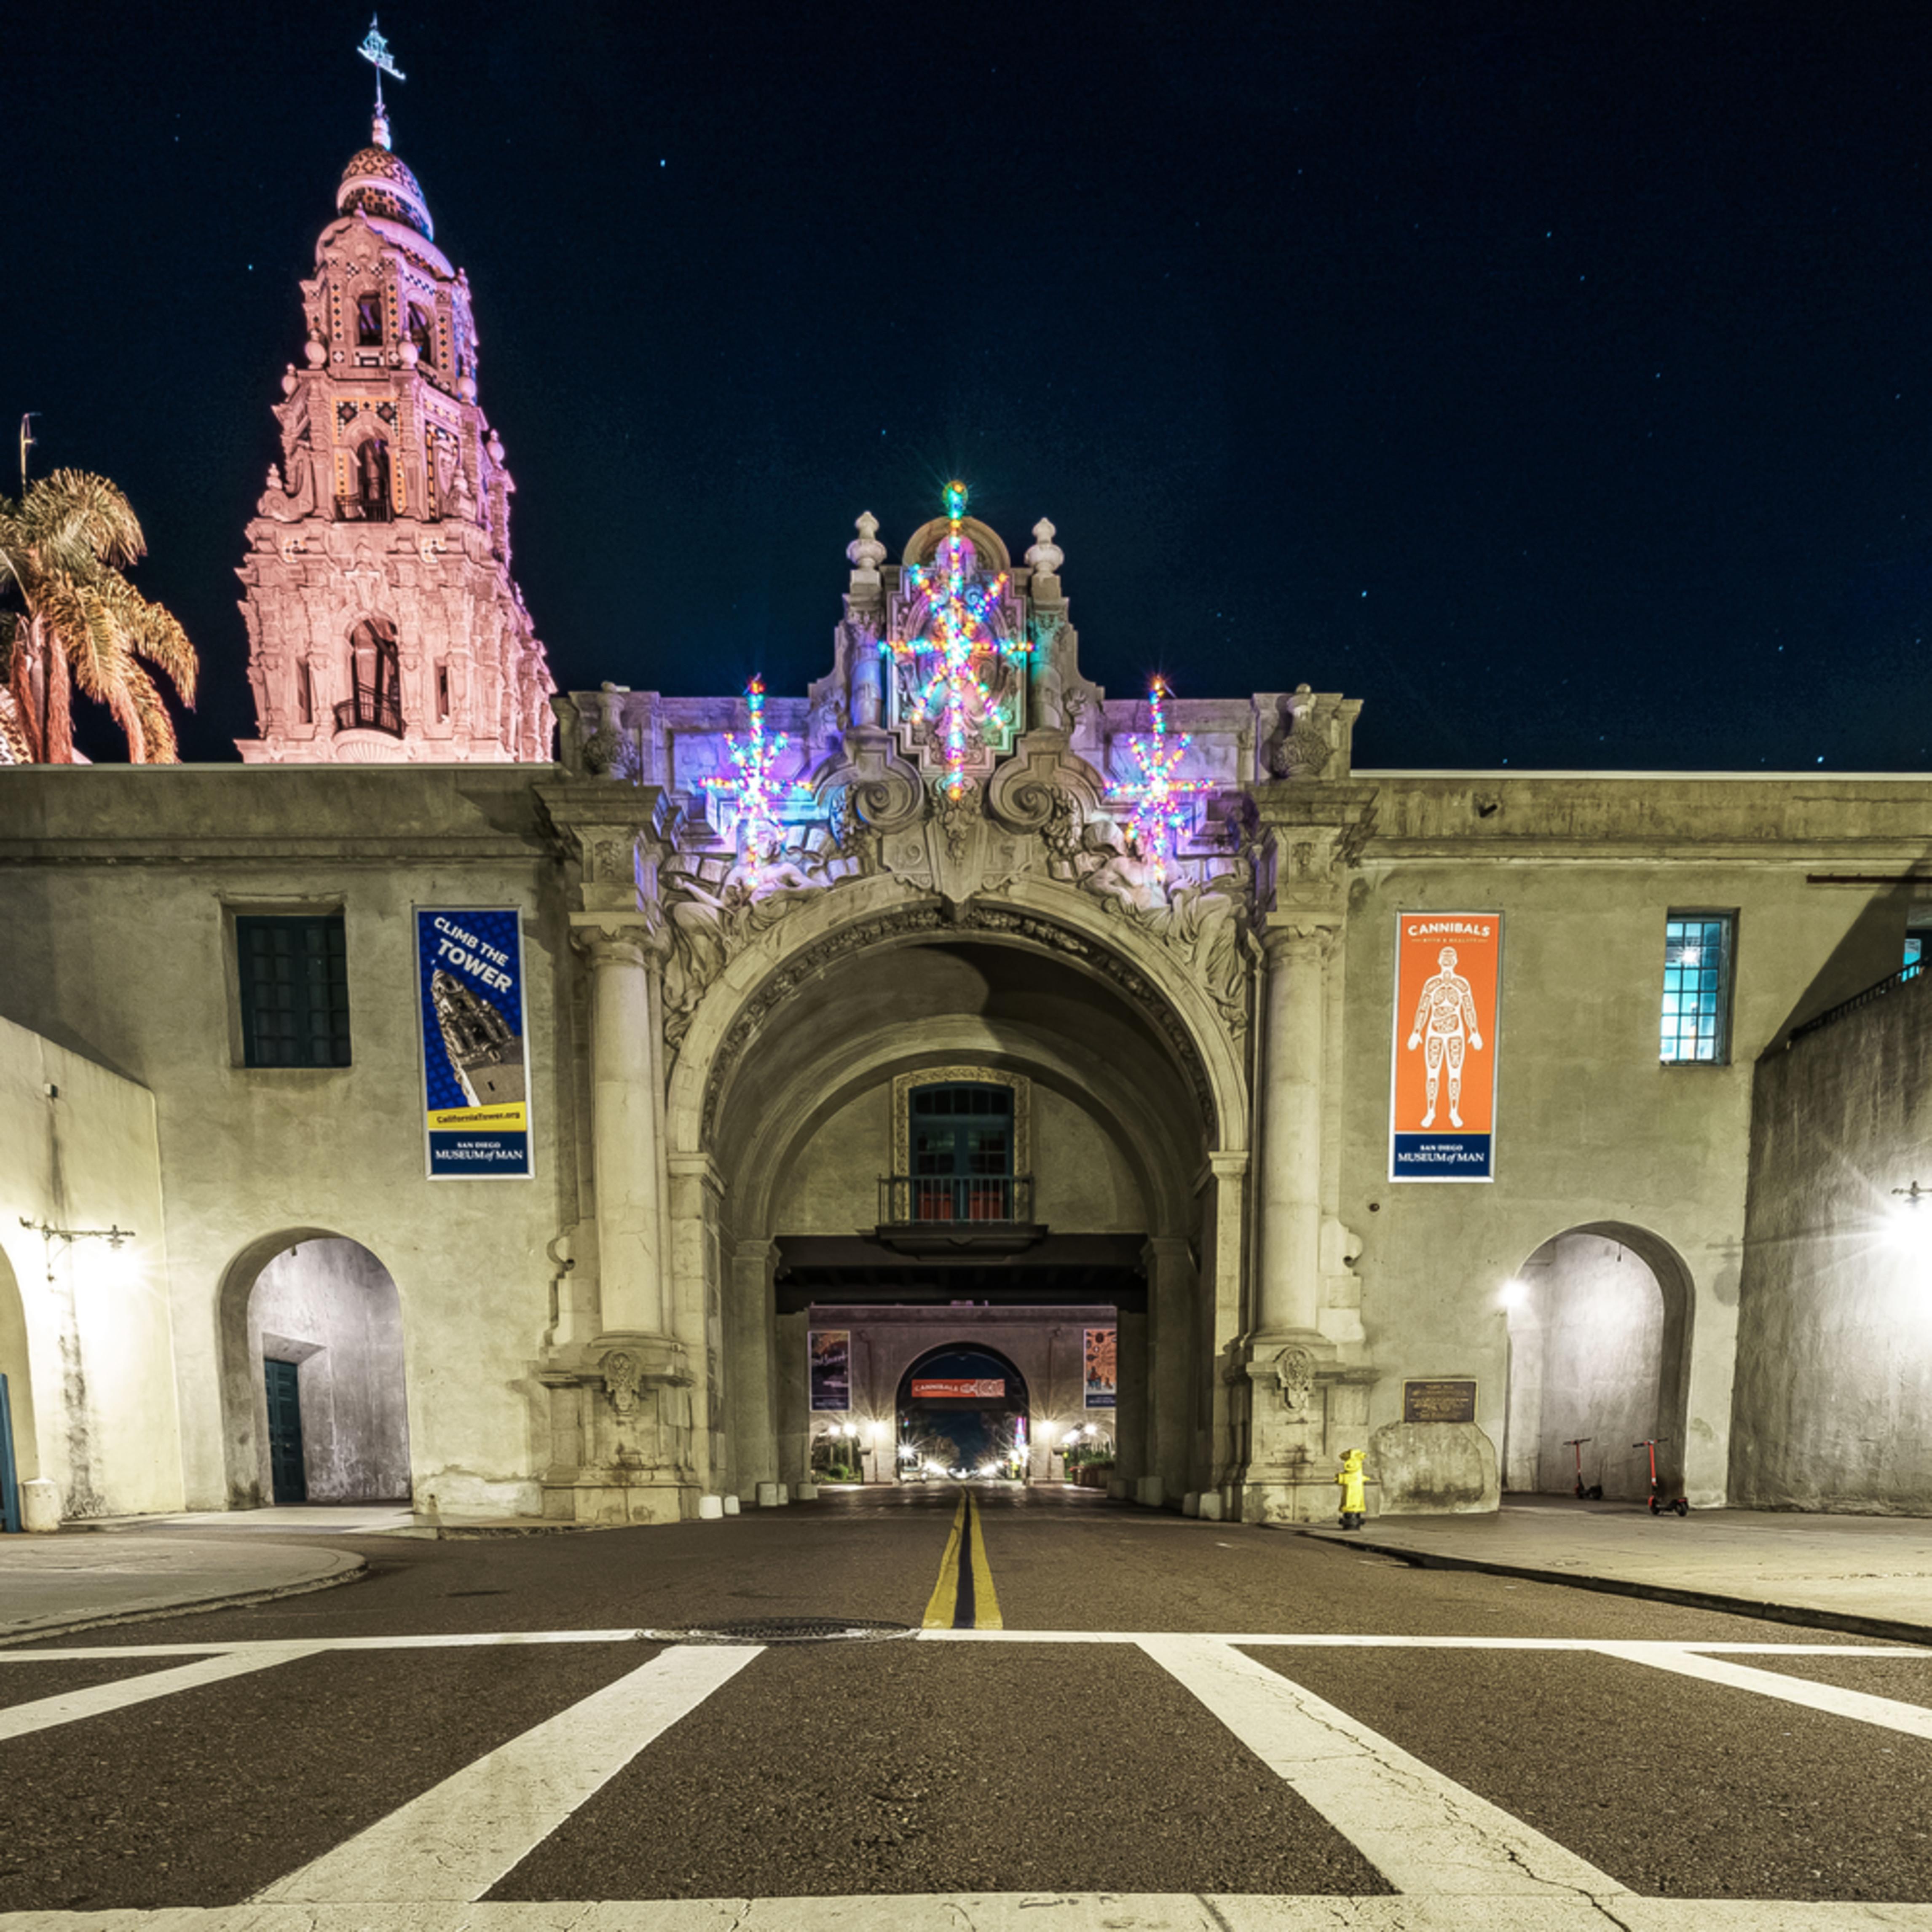 Balboa entrance during holidays ajdfvr